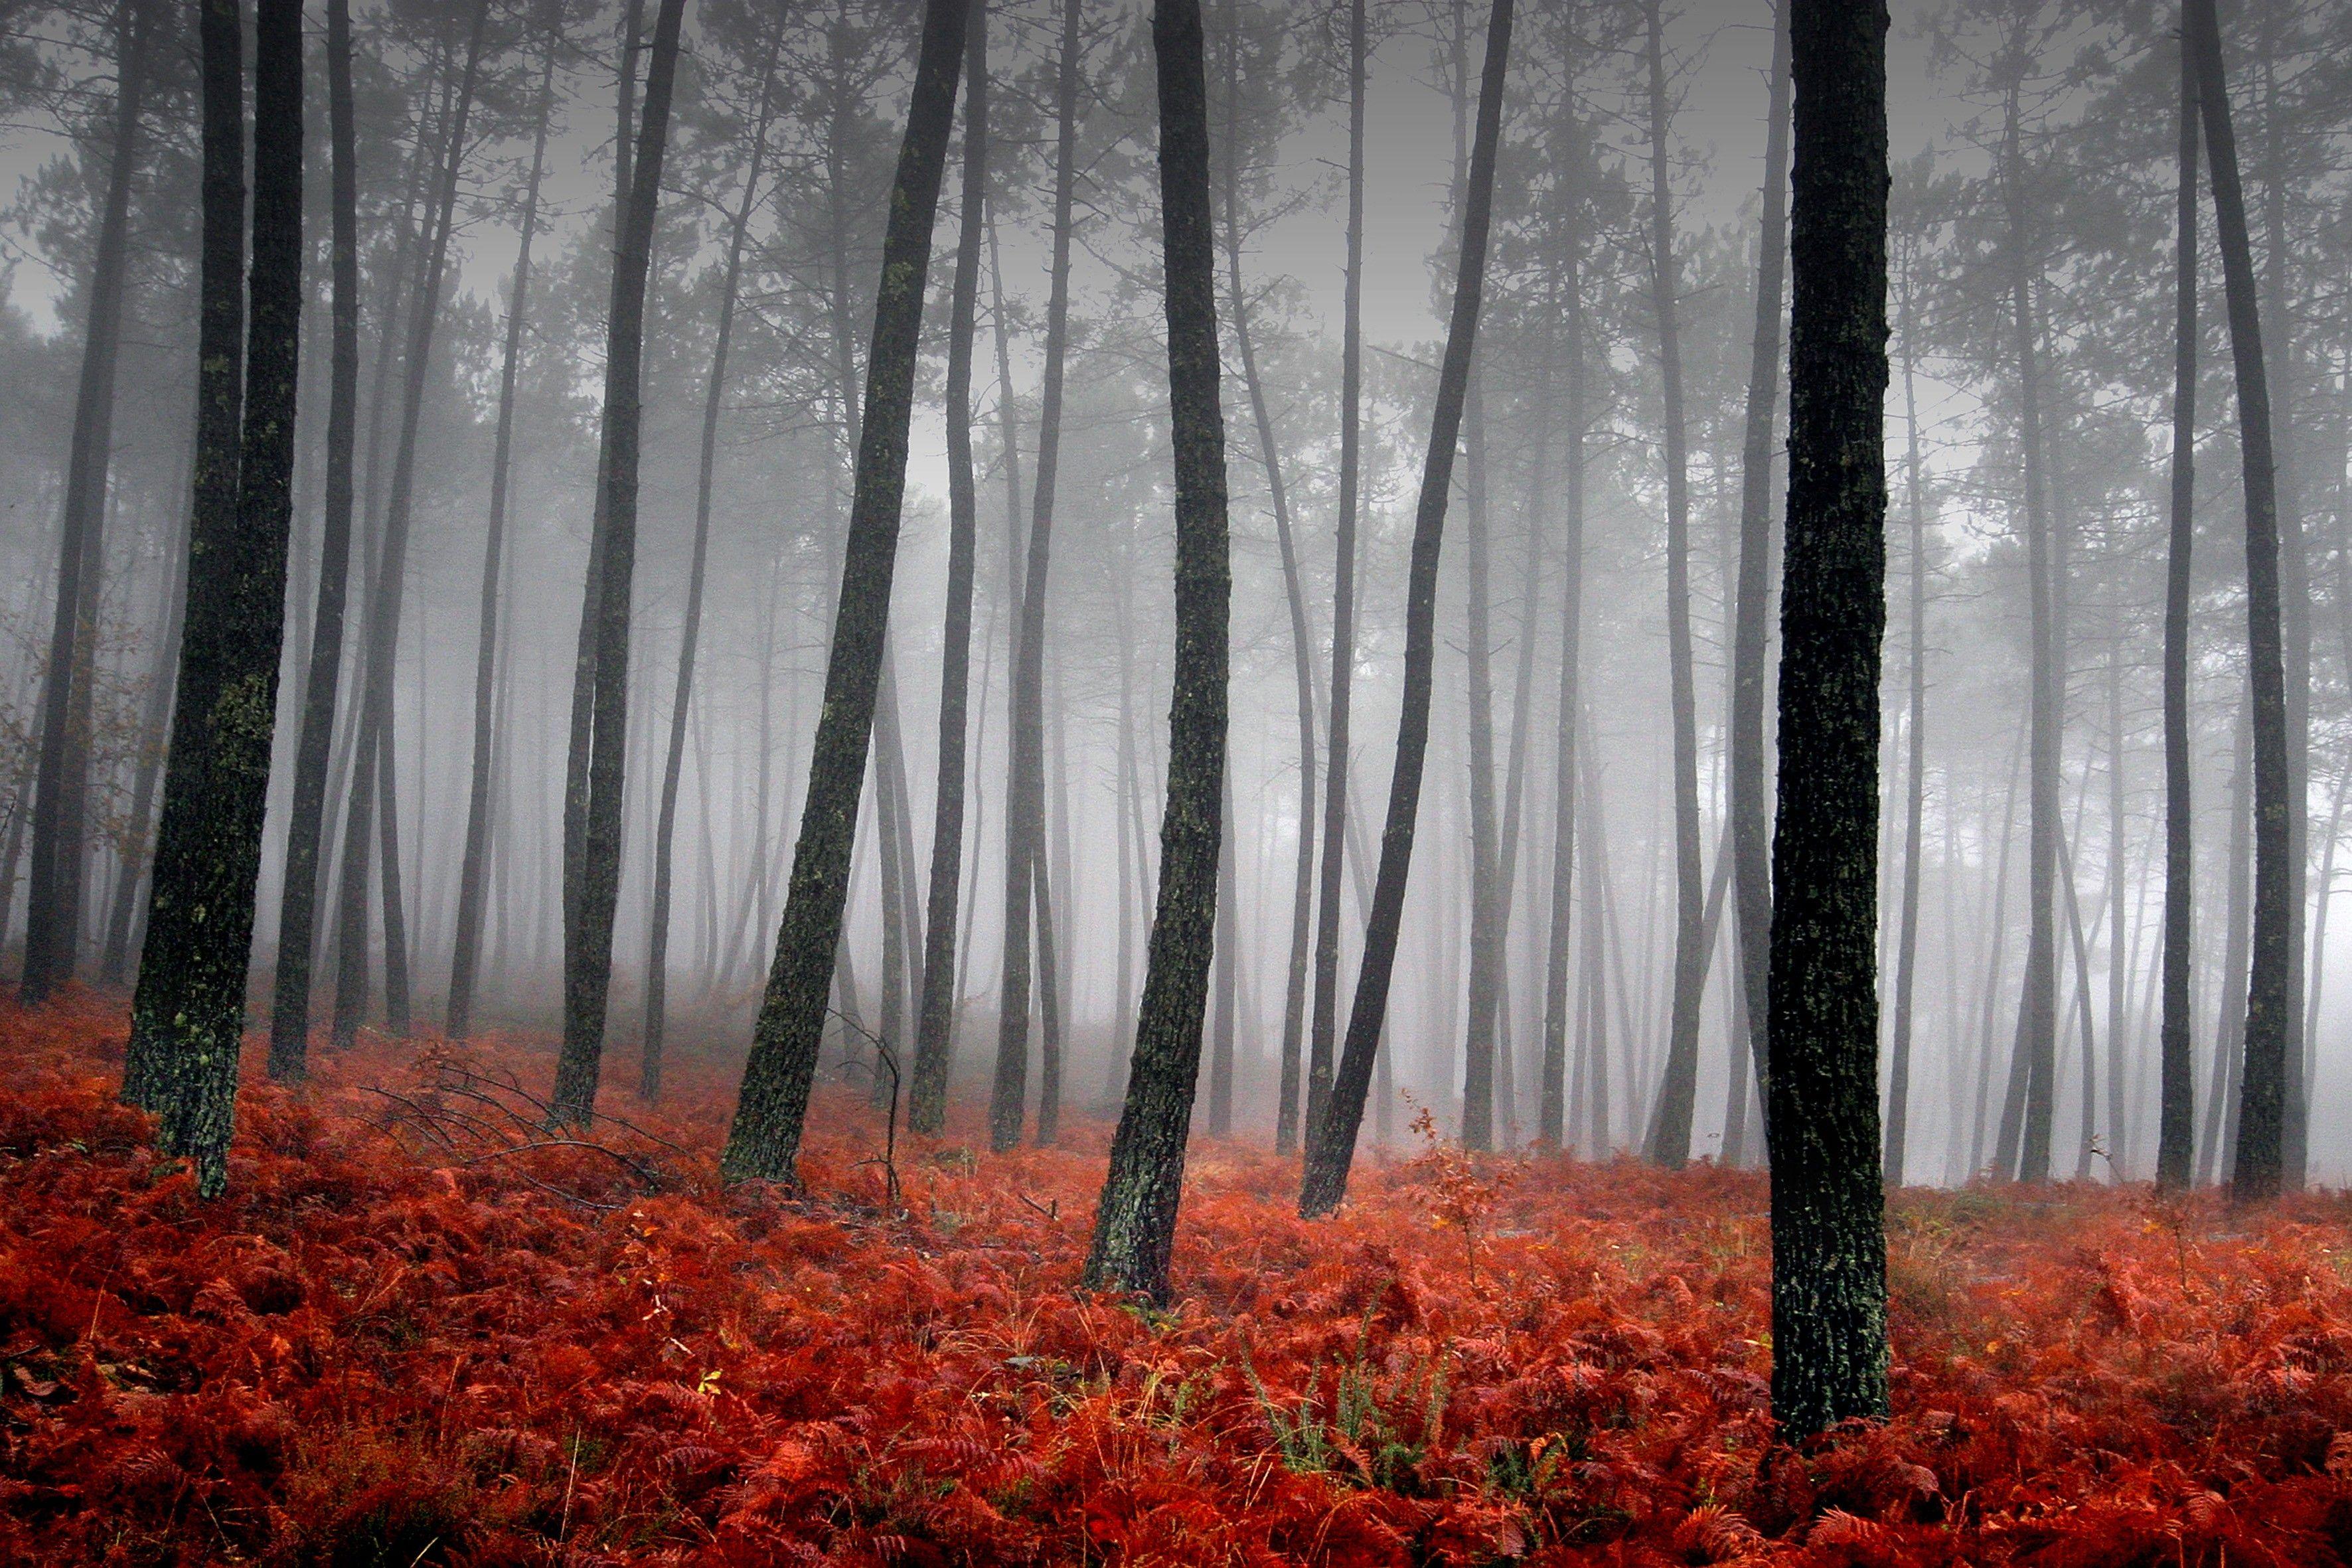 fog-trees-red-grass-autumn.jpg